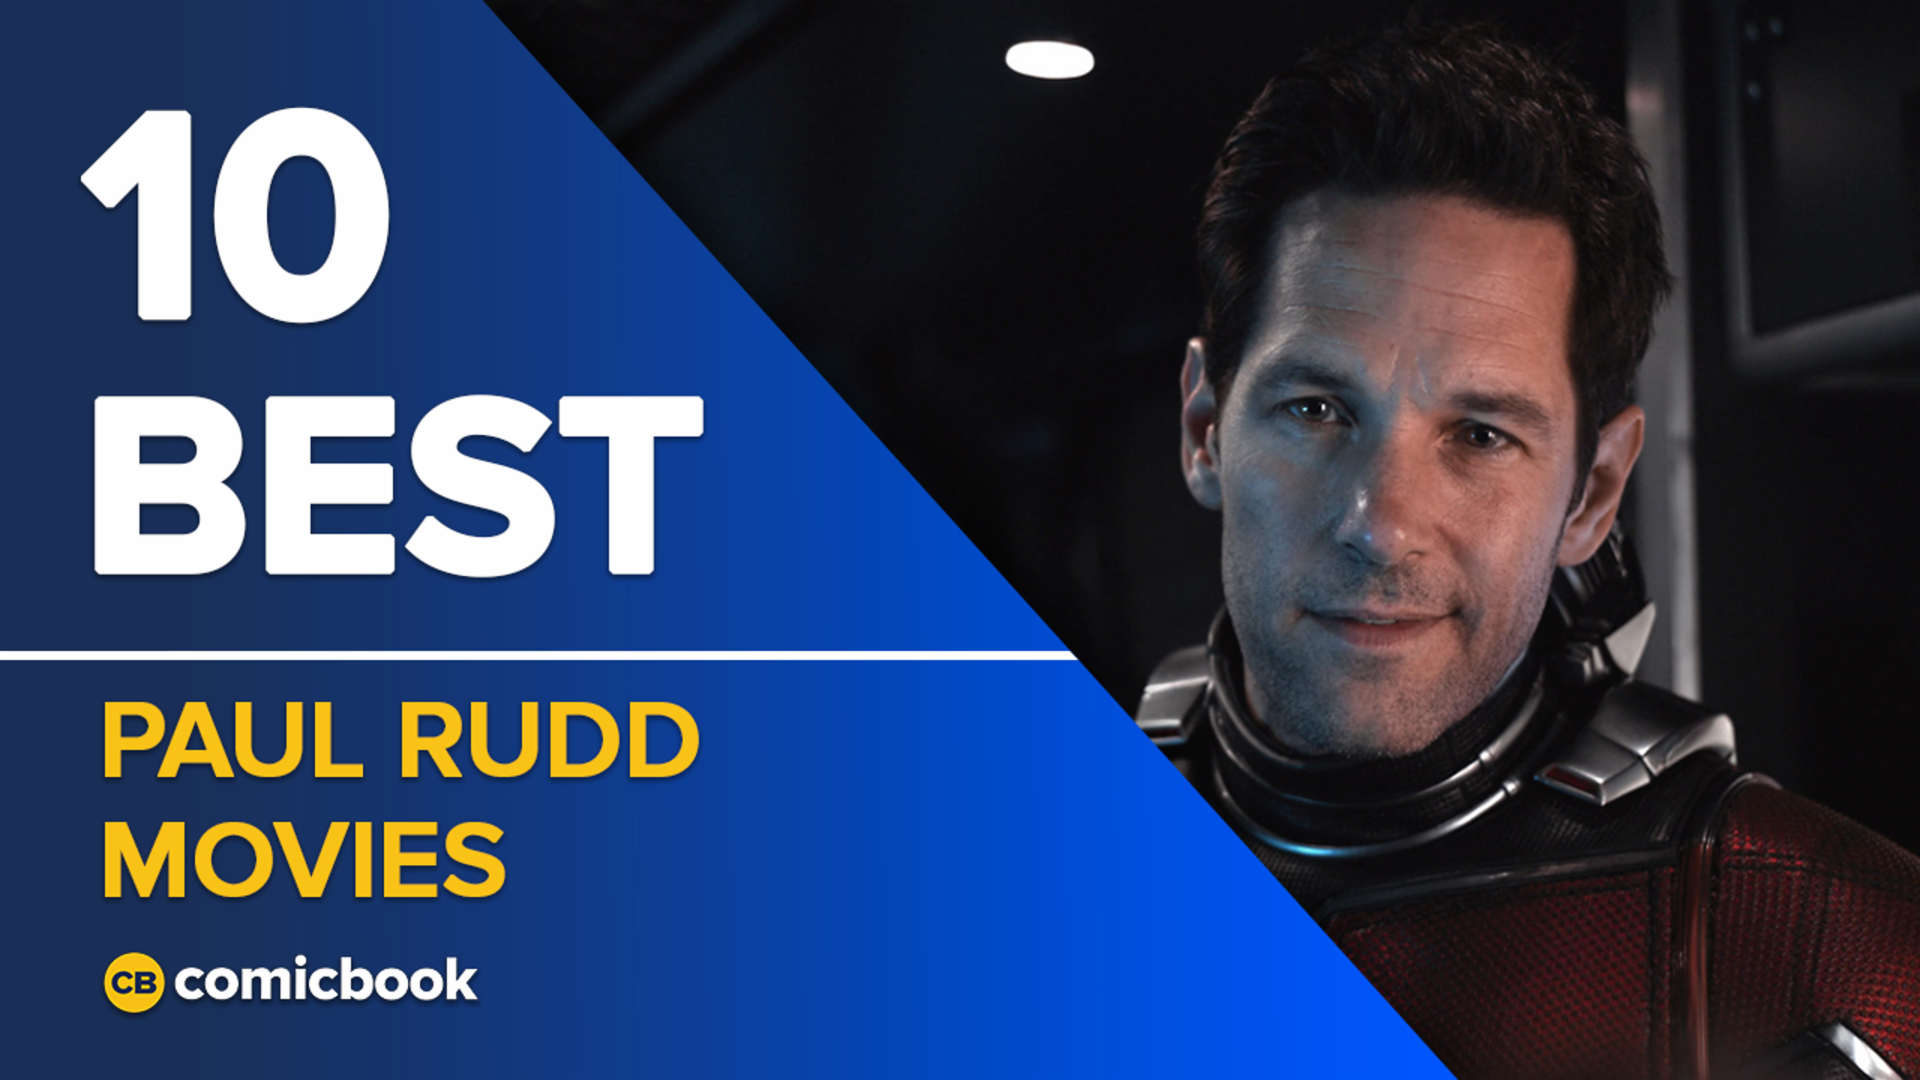 10 Best Paul Rudd Movies screen capture